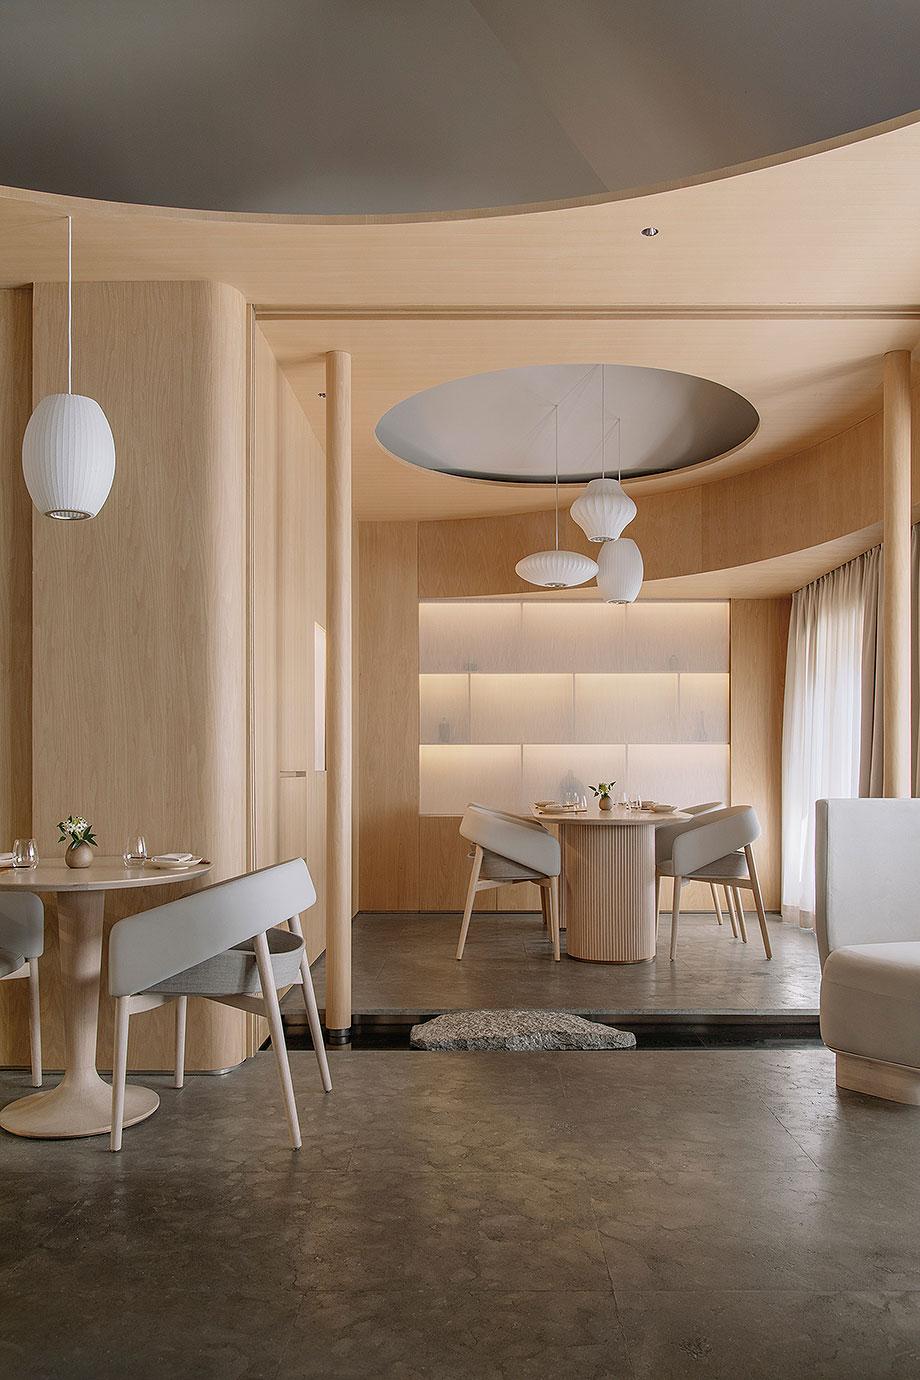 restaurante lunar en shanghai de so studio (9) - foto wen studio